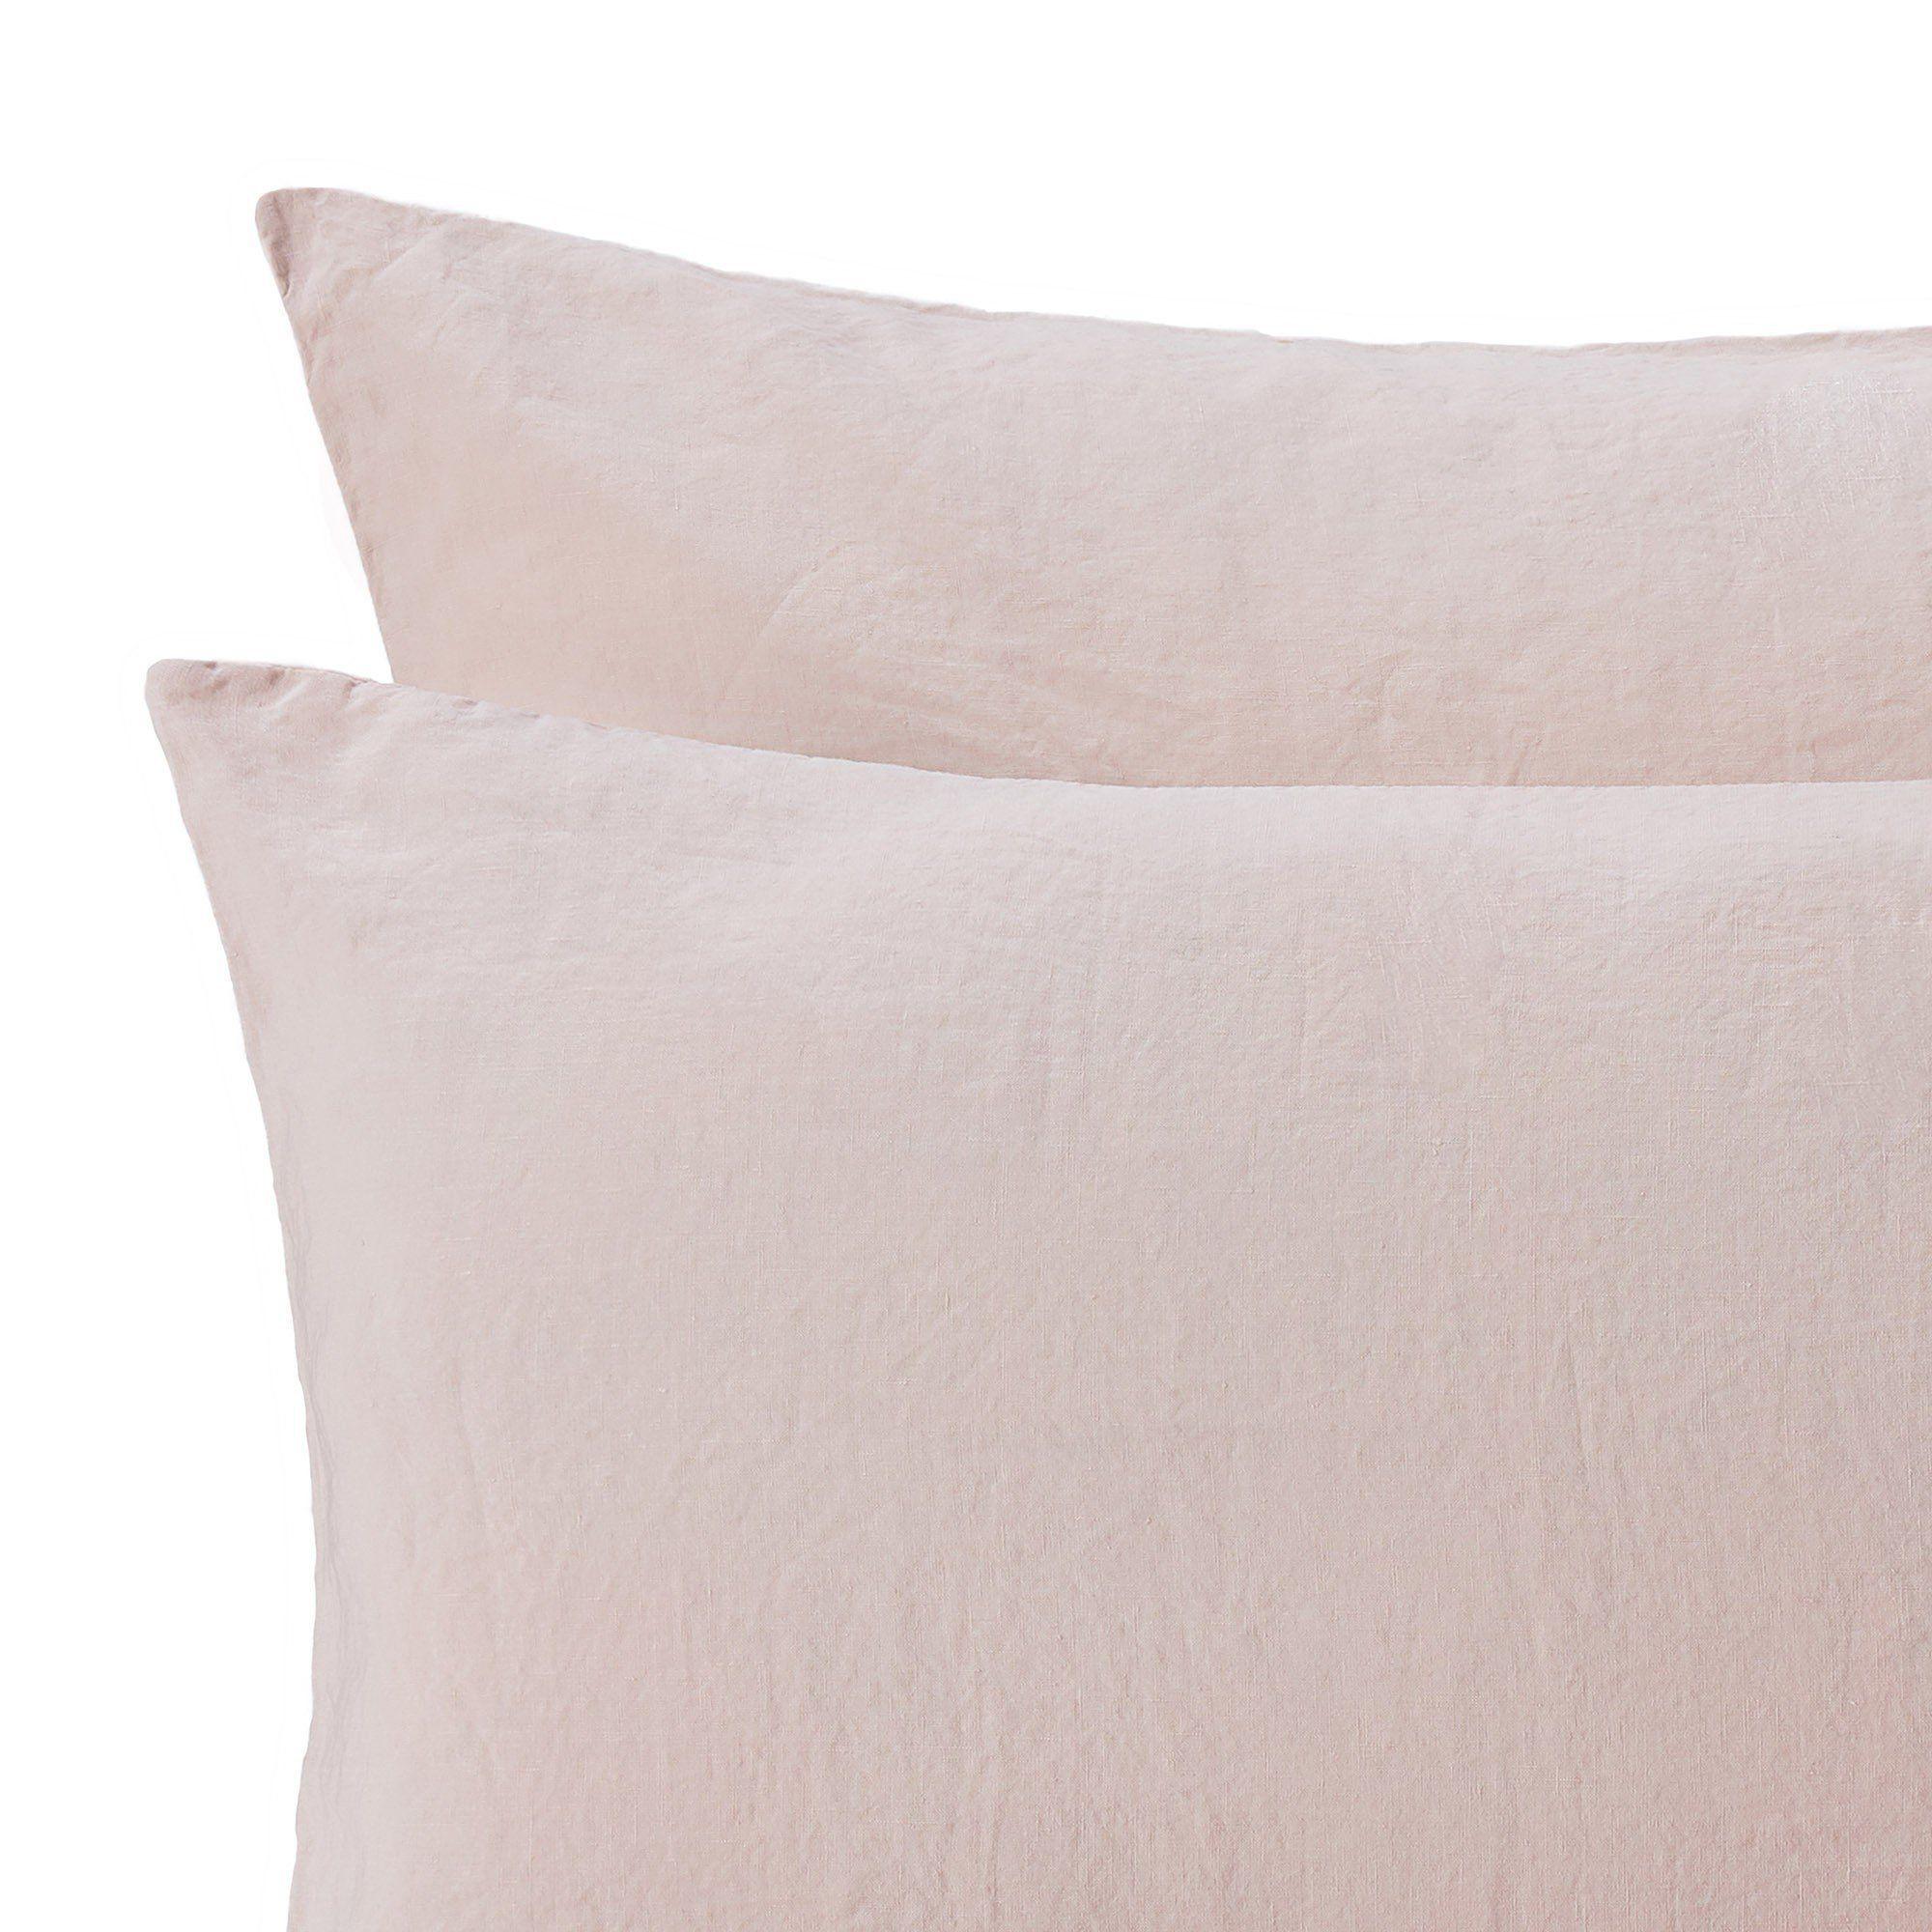 Bettwasche Bettwasche Weisse Bettwasche Und Kopfkissenbezug